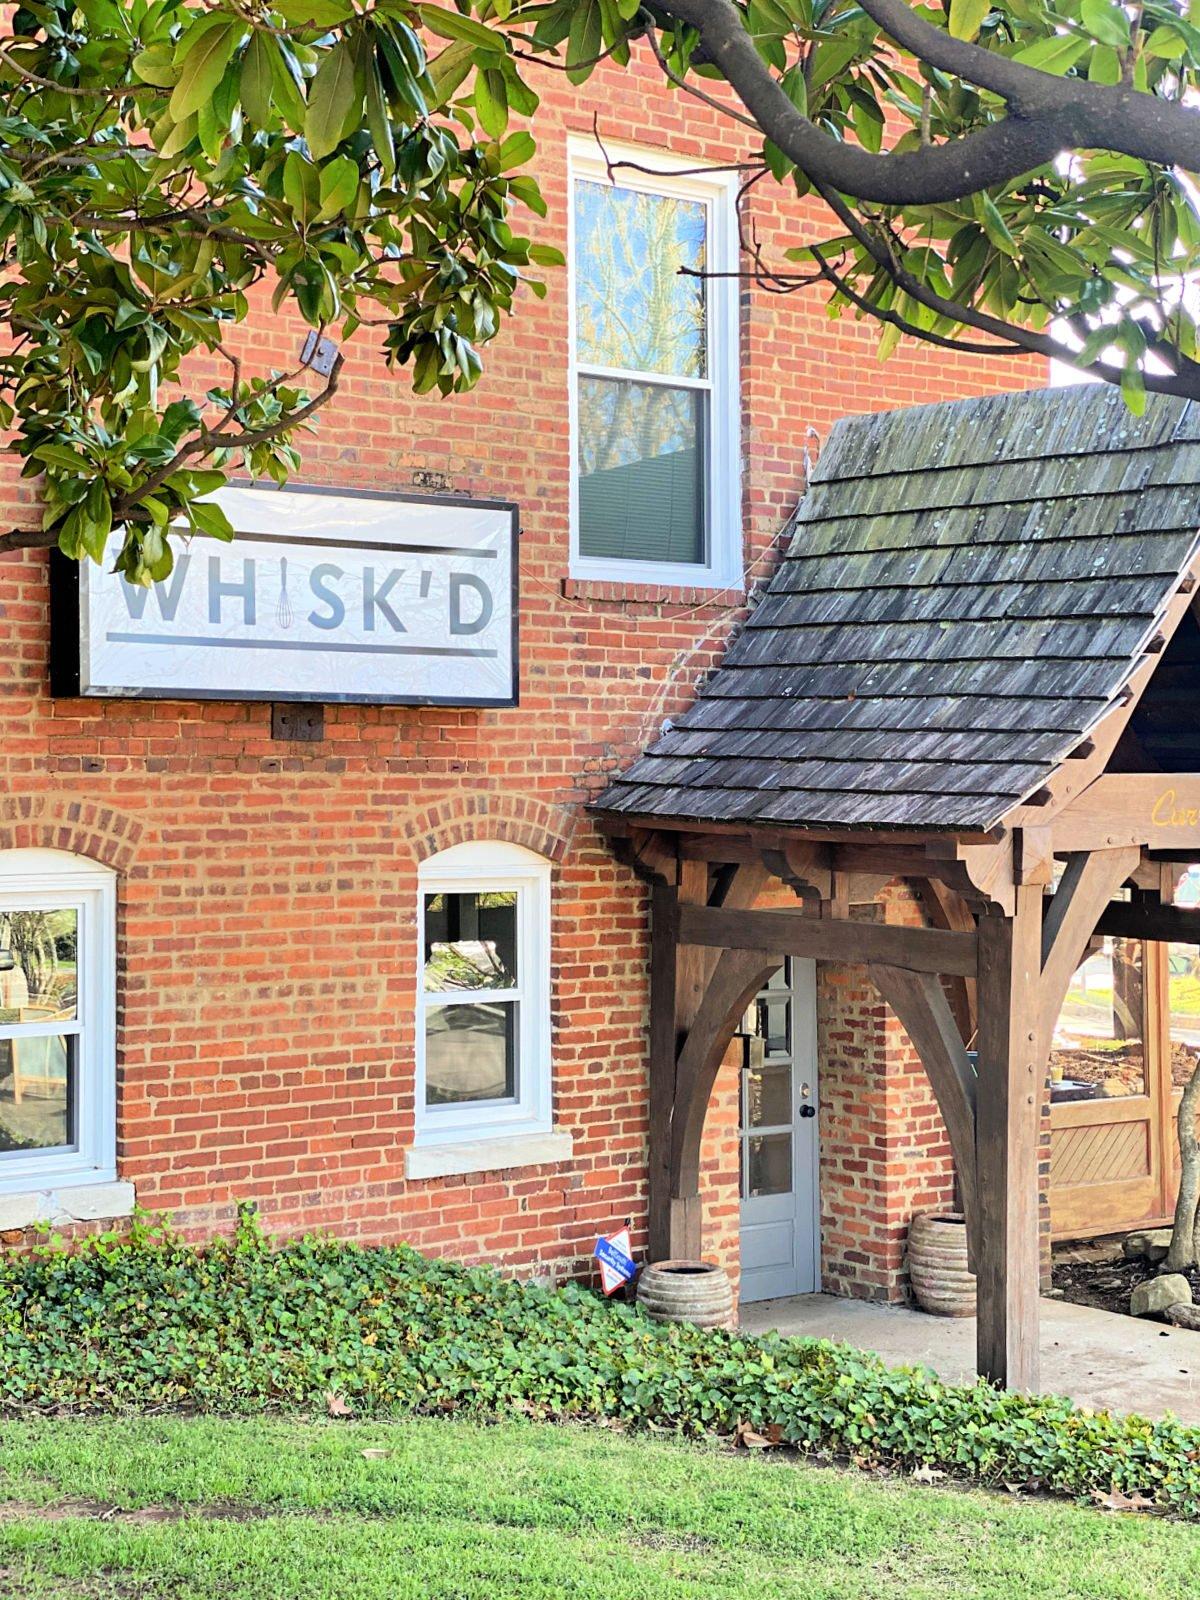 Front entrance of Whisk'd Cafe in Decatur.